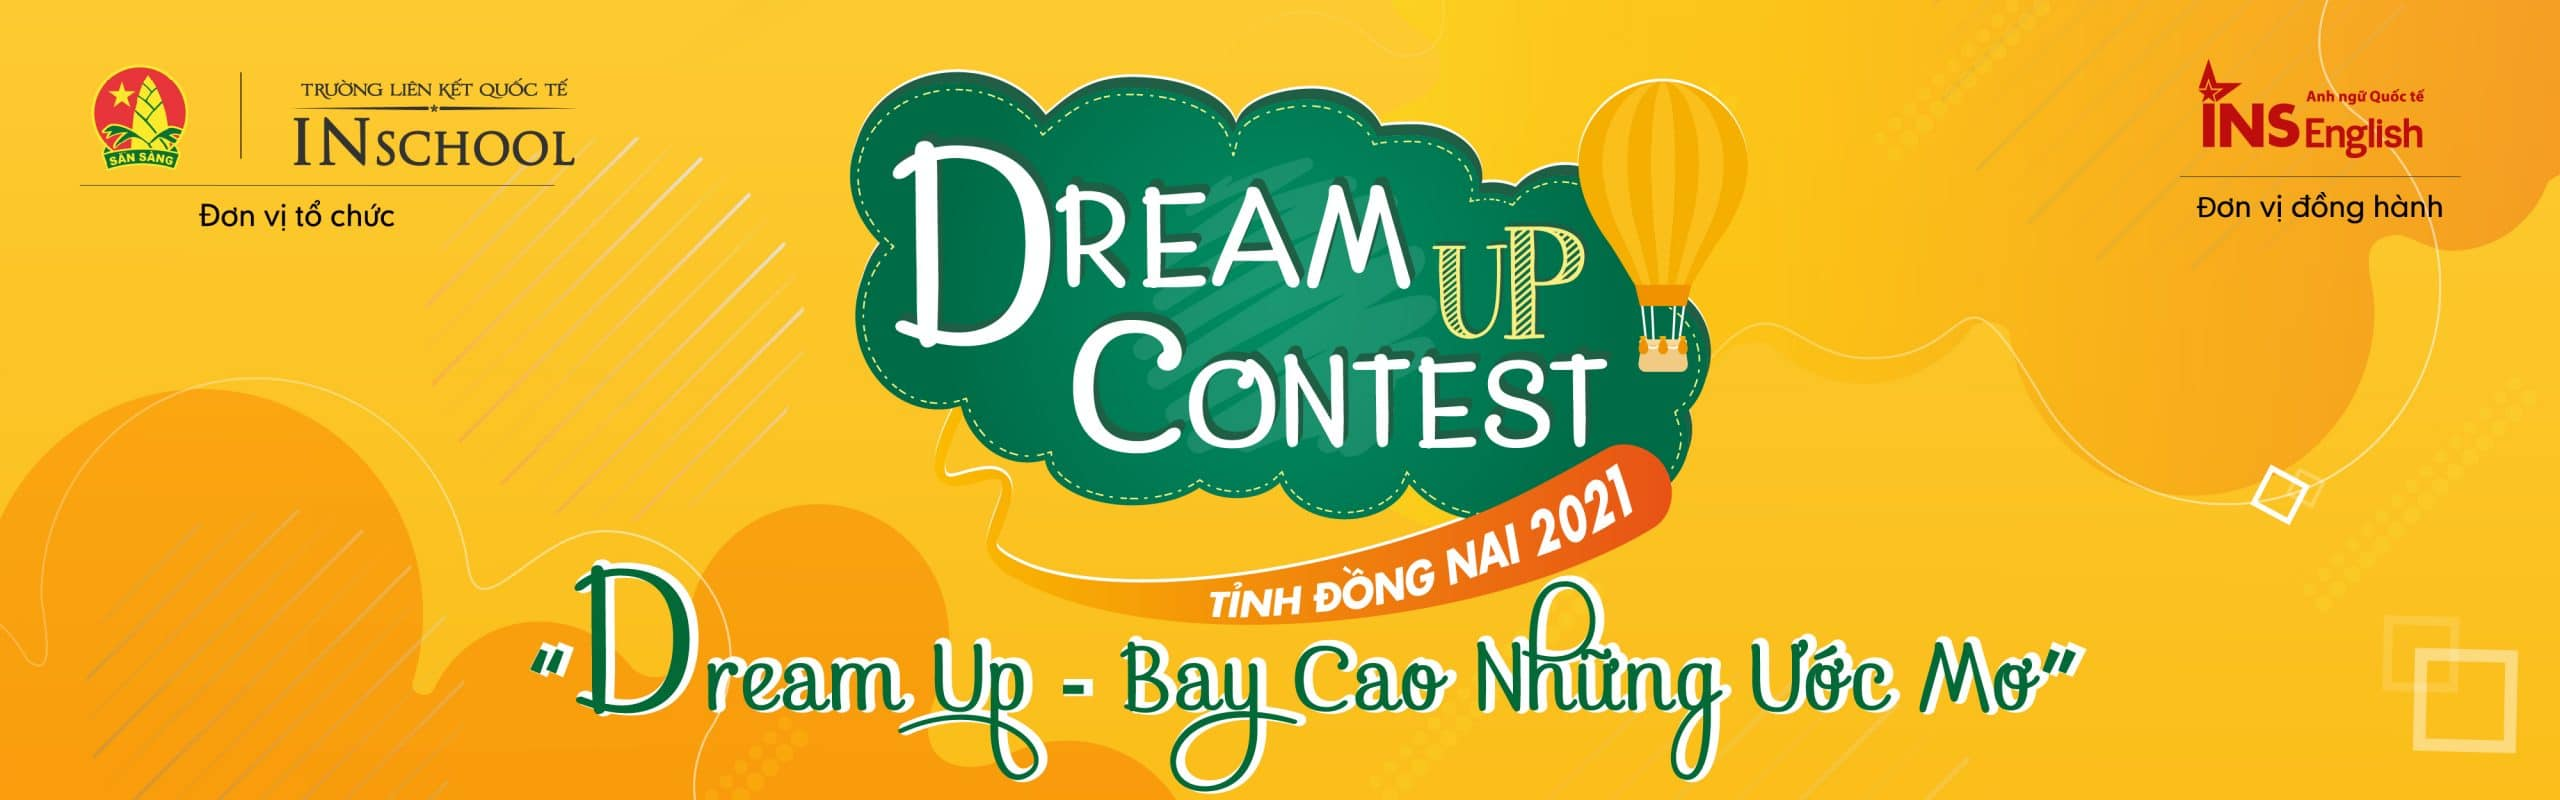 "DREAM UP CONTEST 2021 ""Bay cao những ước mơ"""